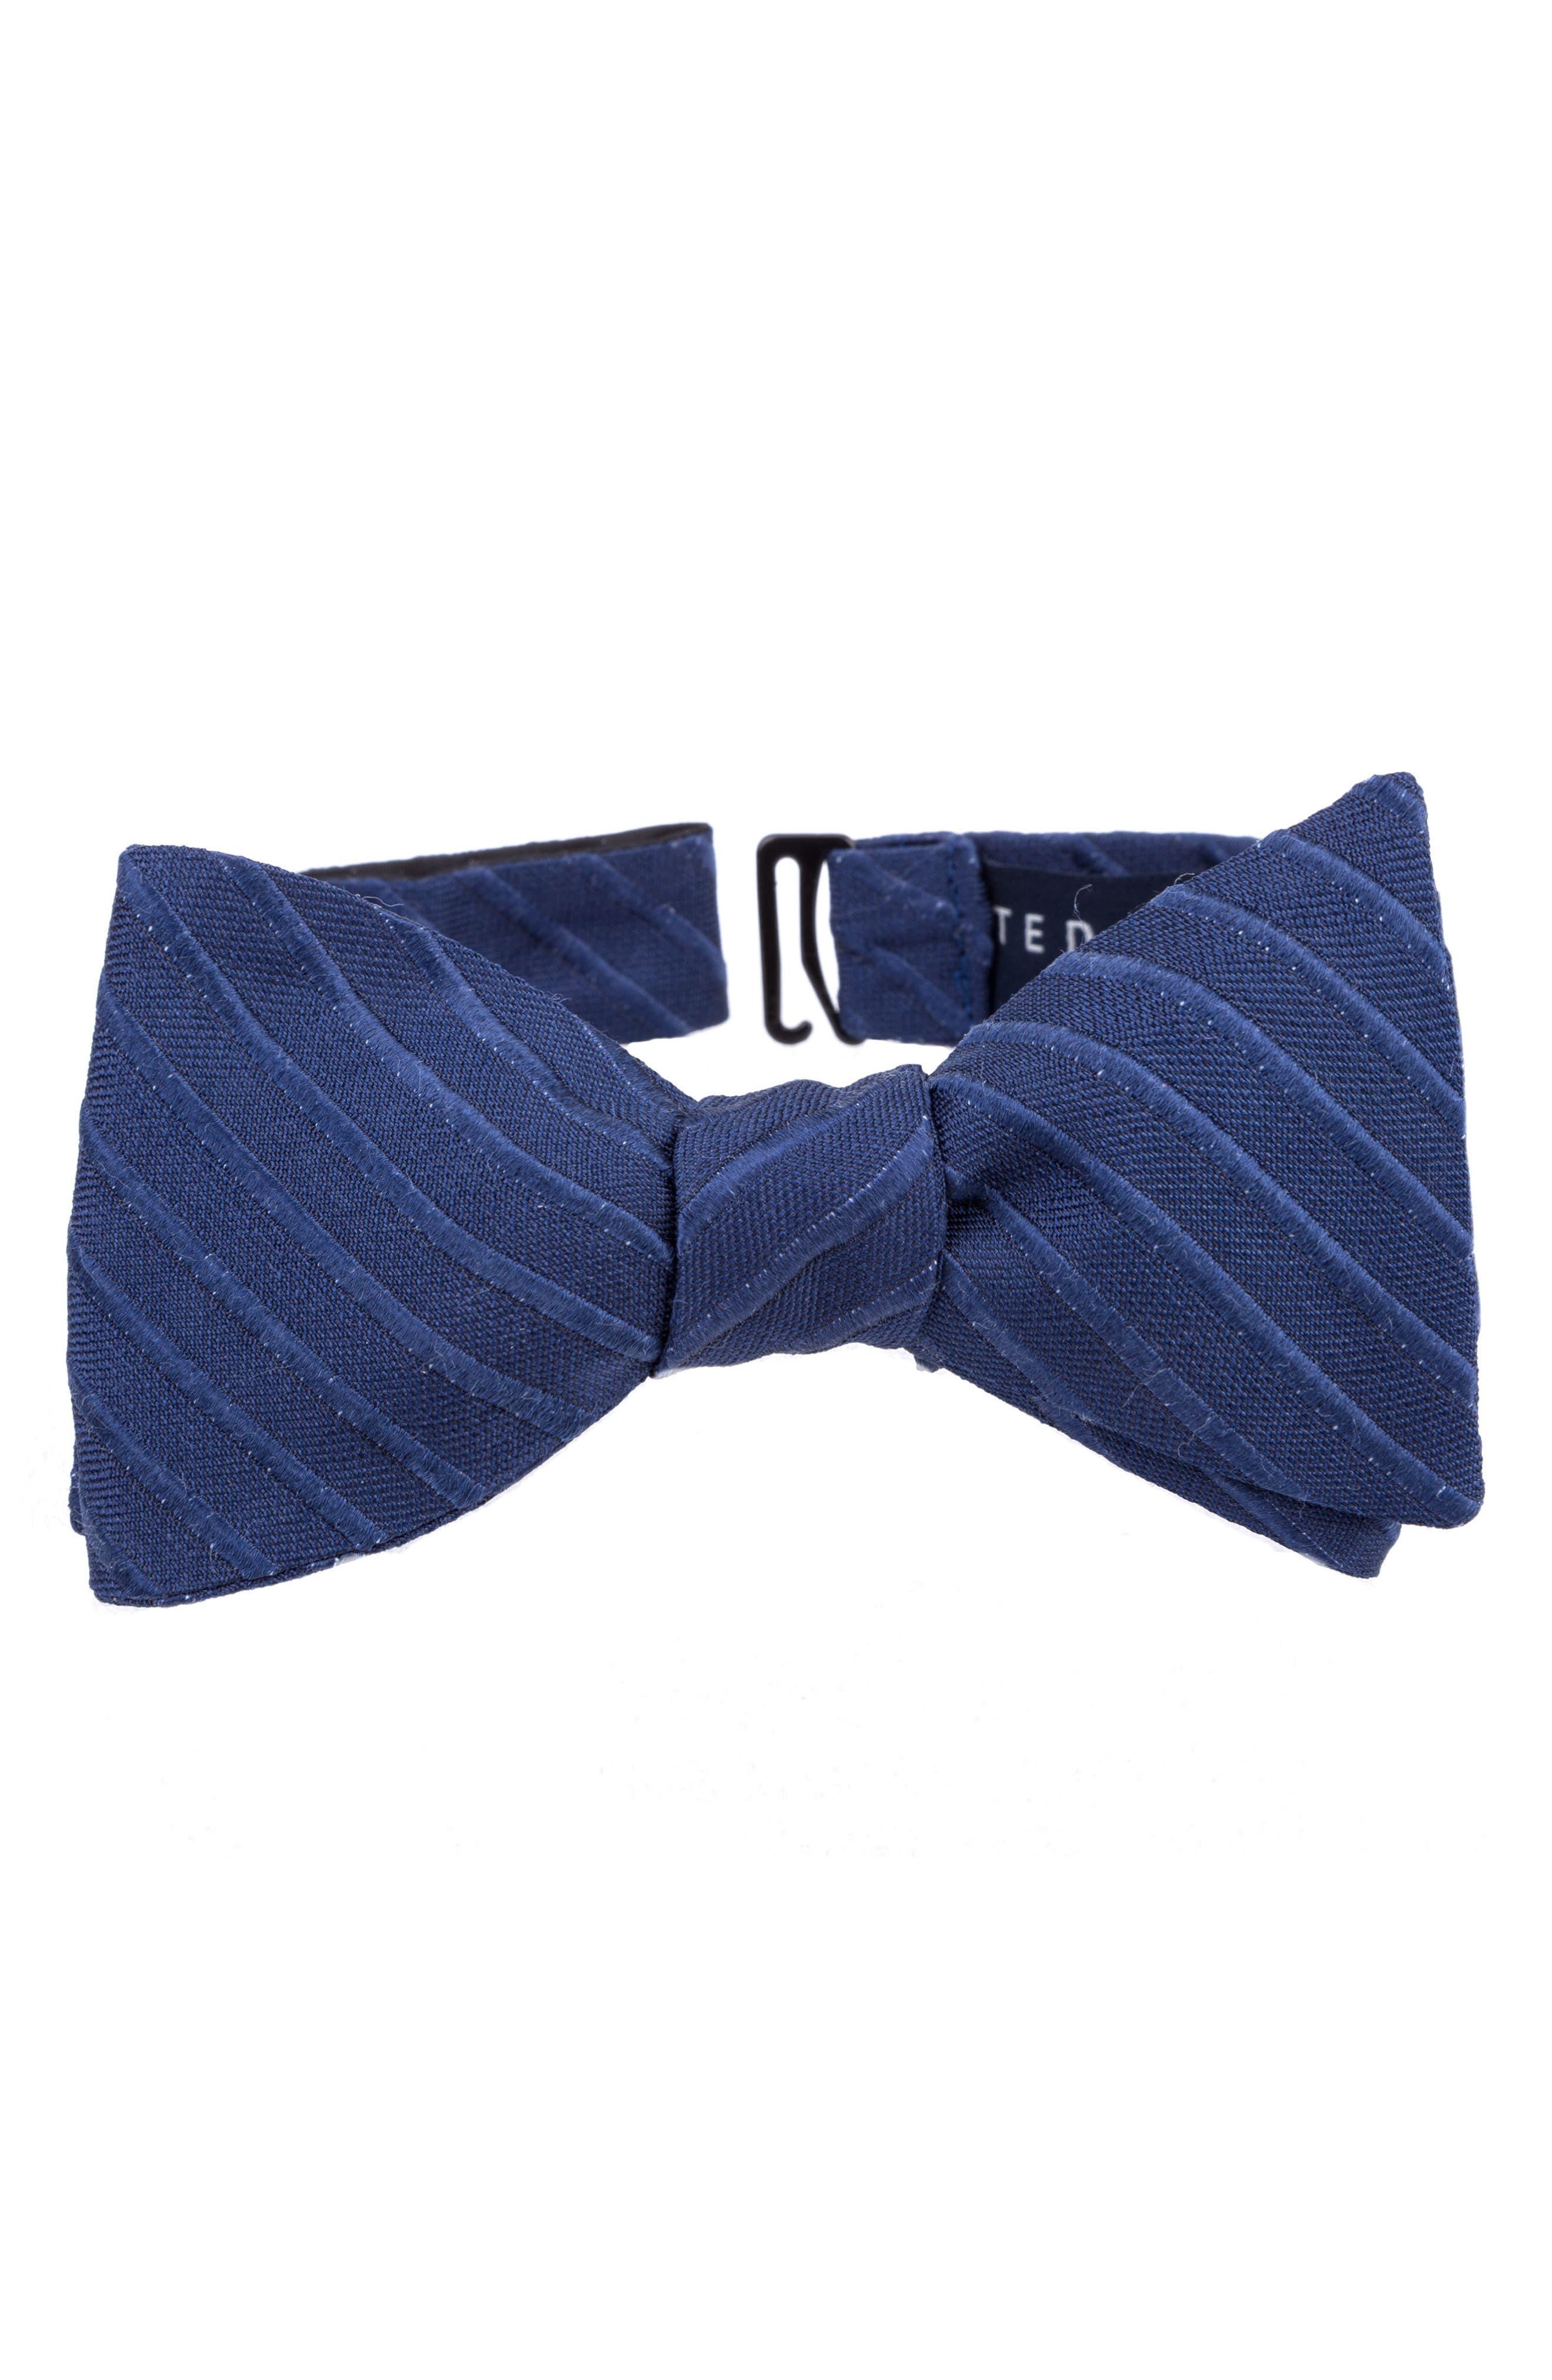 Main Image - Ted Baker London Indigo Wardrobe Silk Bow Tie